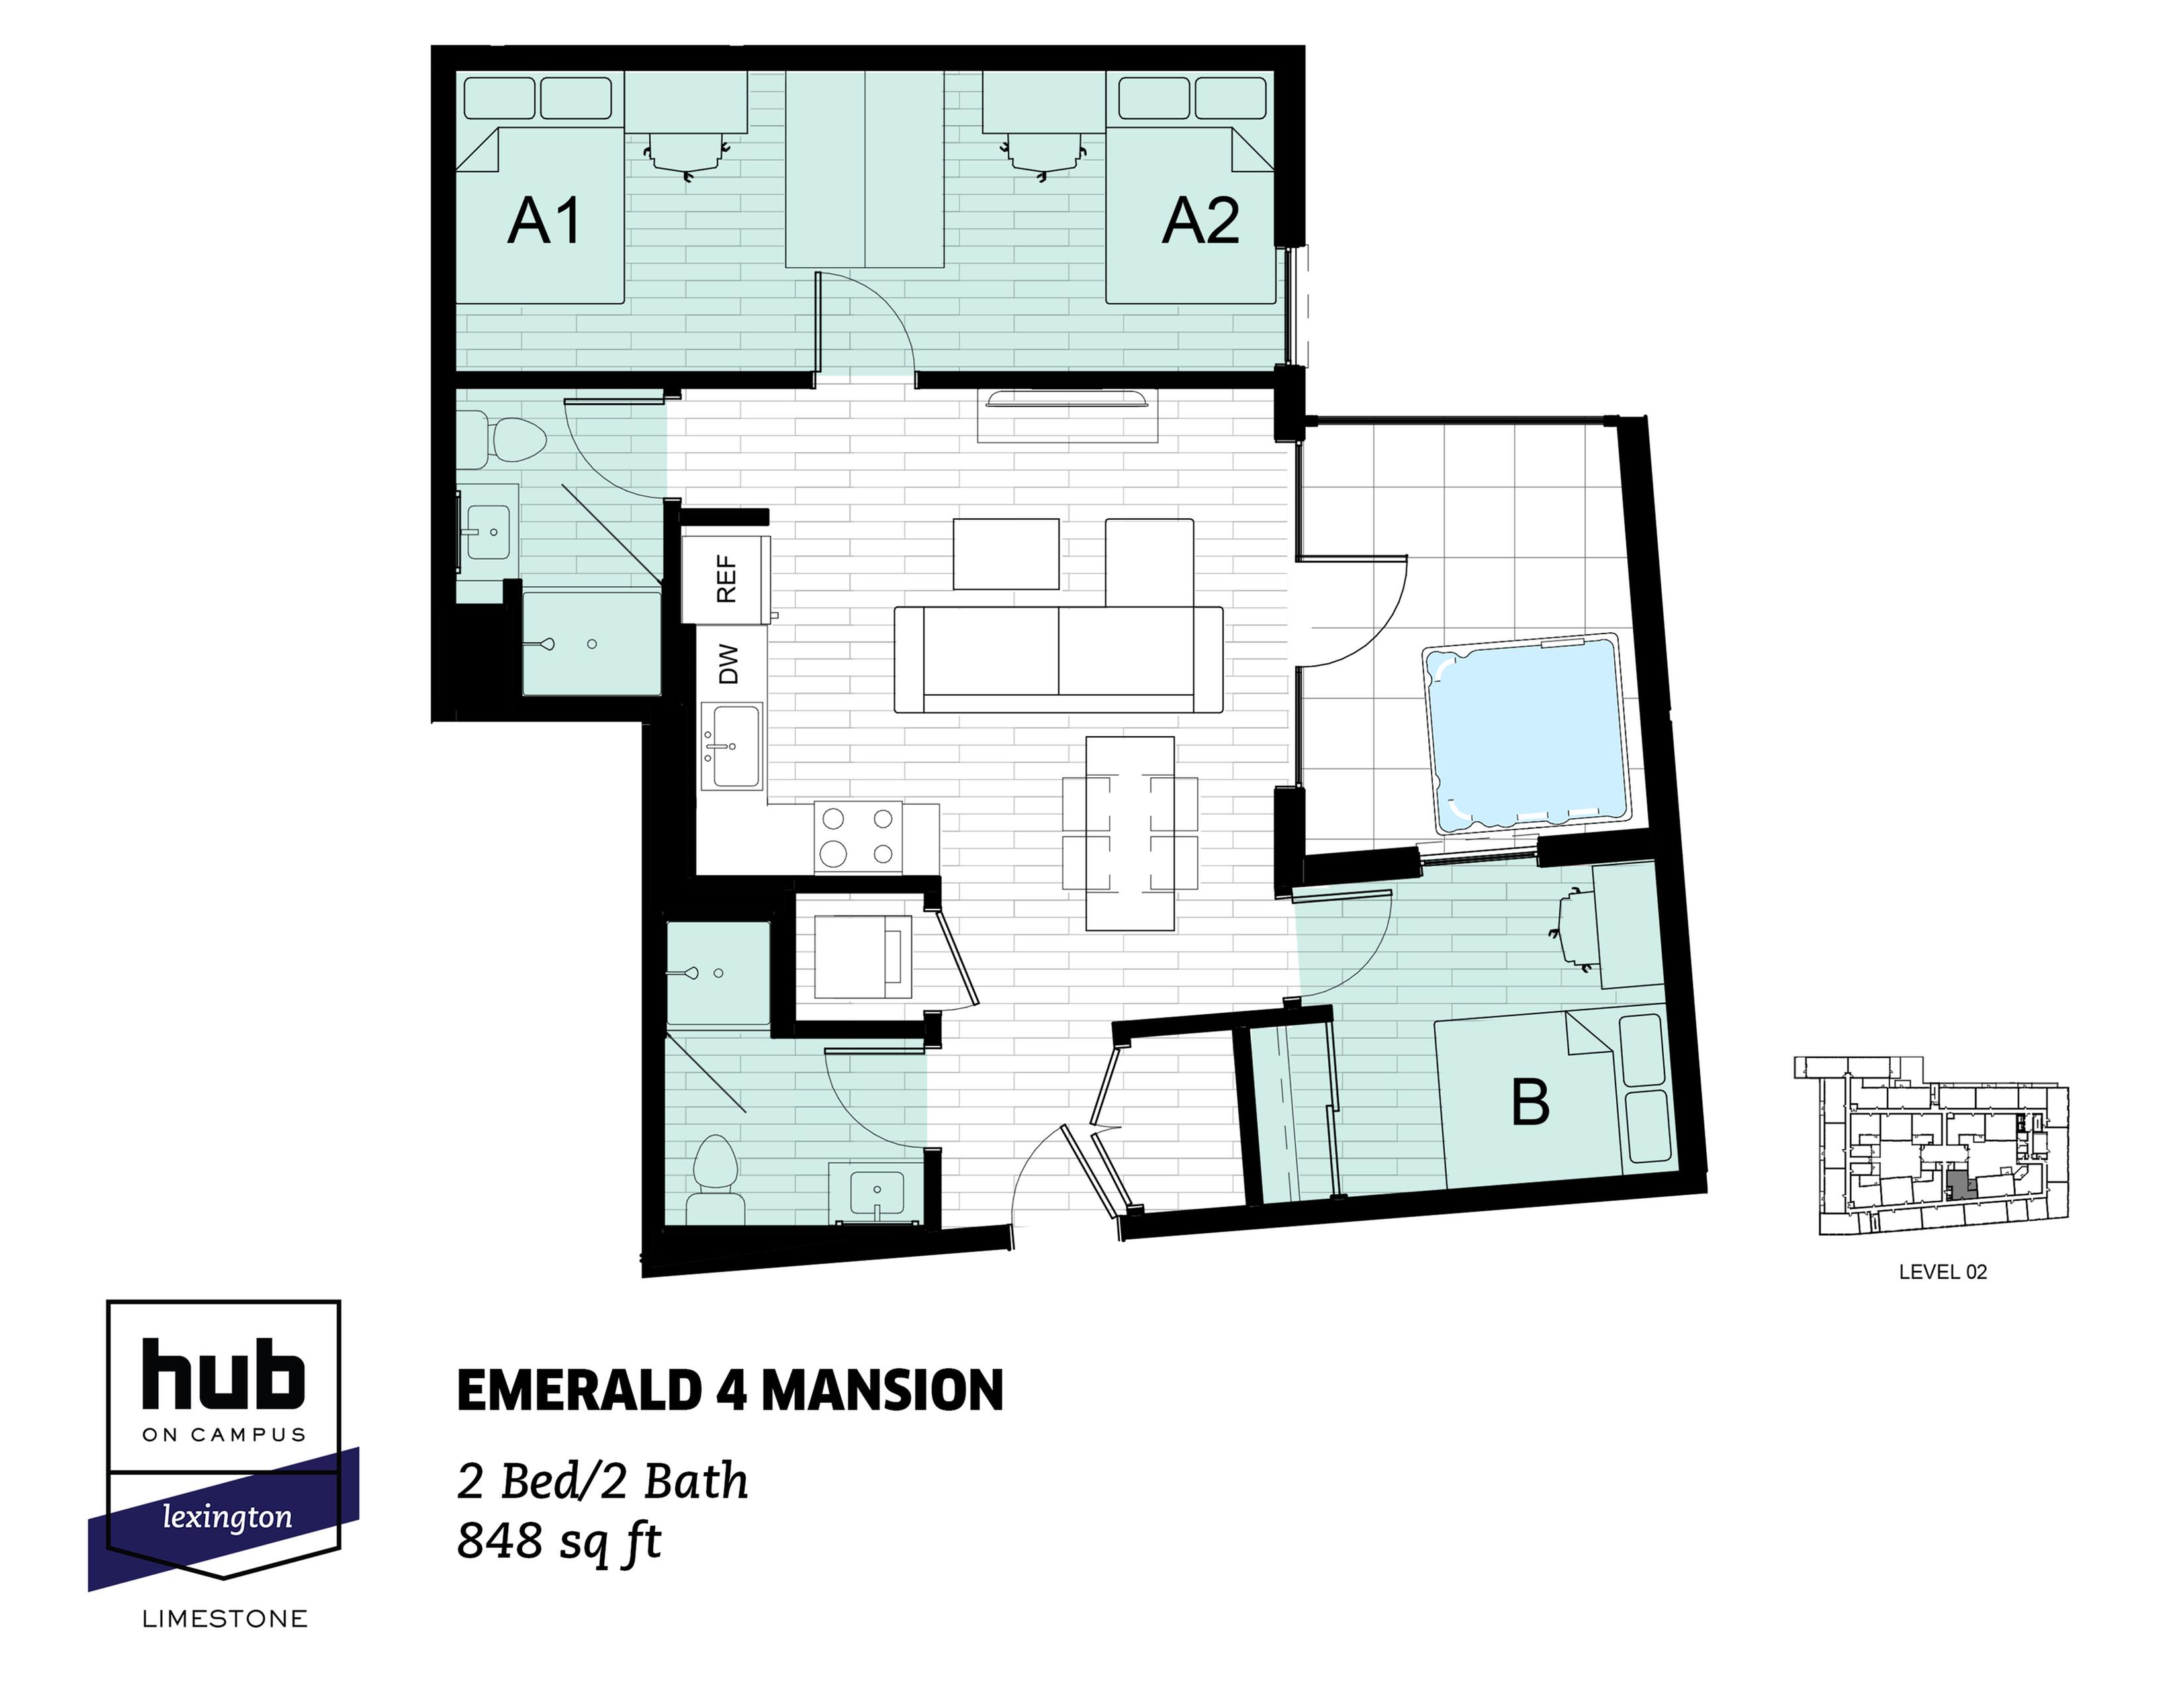 Emerald 4 Mansion